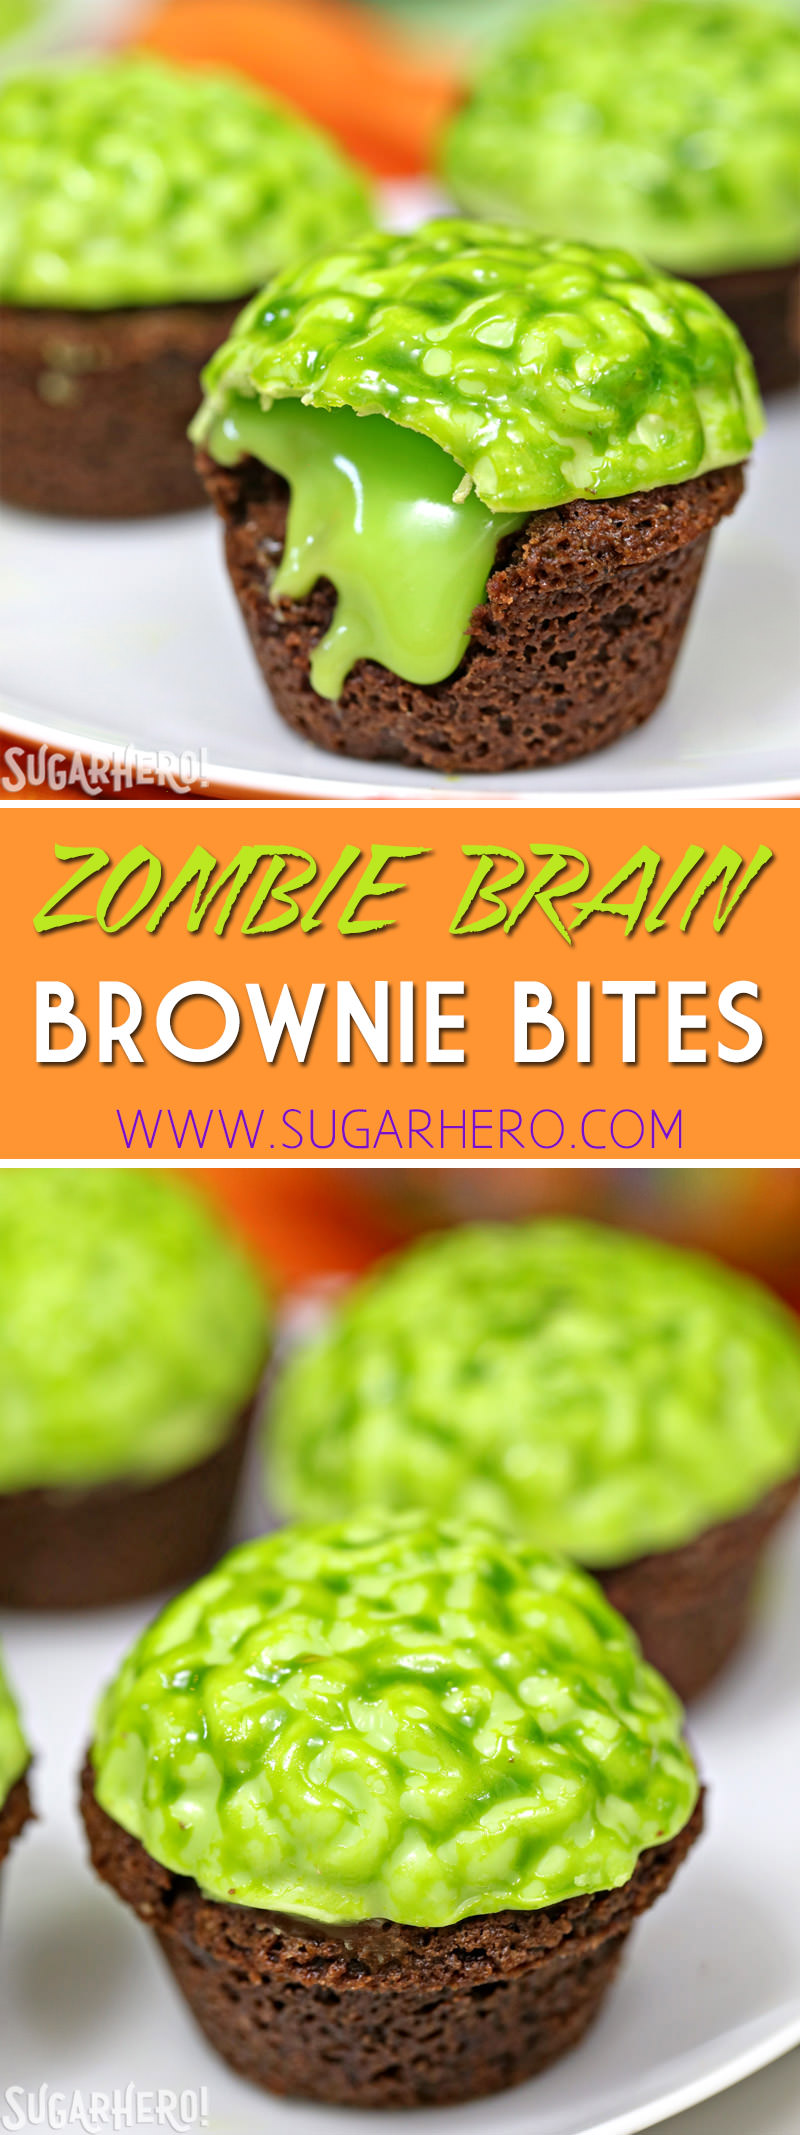 Zombie Brain Brownie Bites - SugarHero